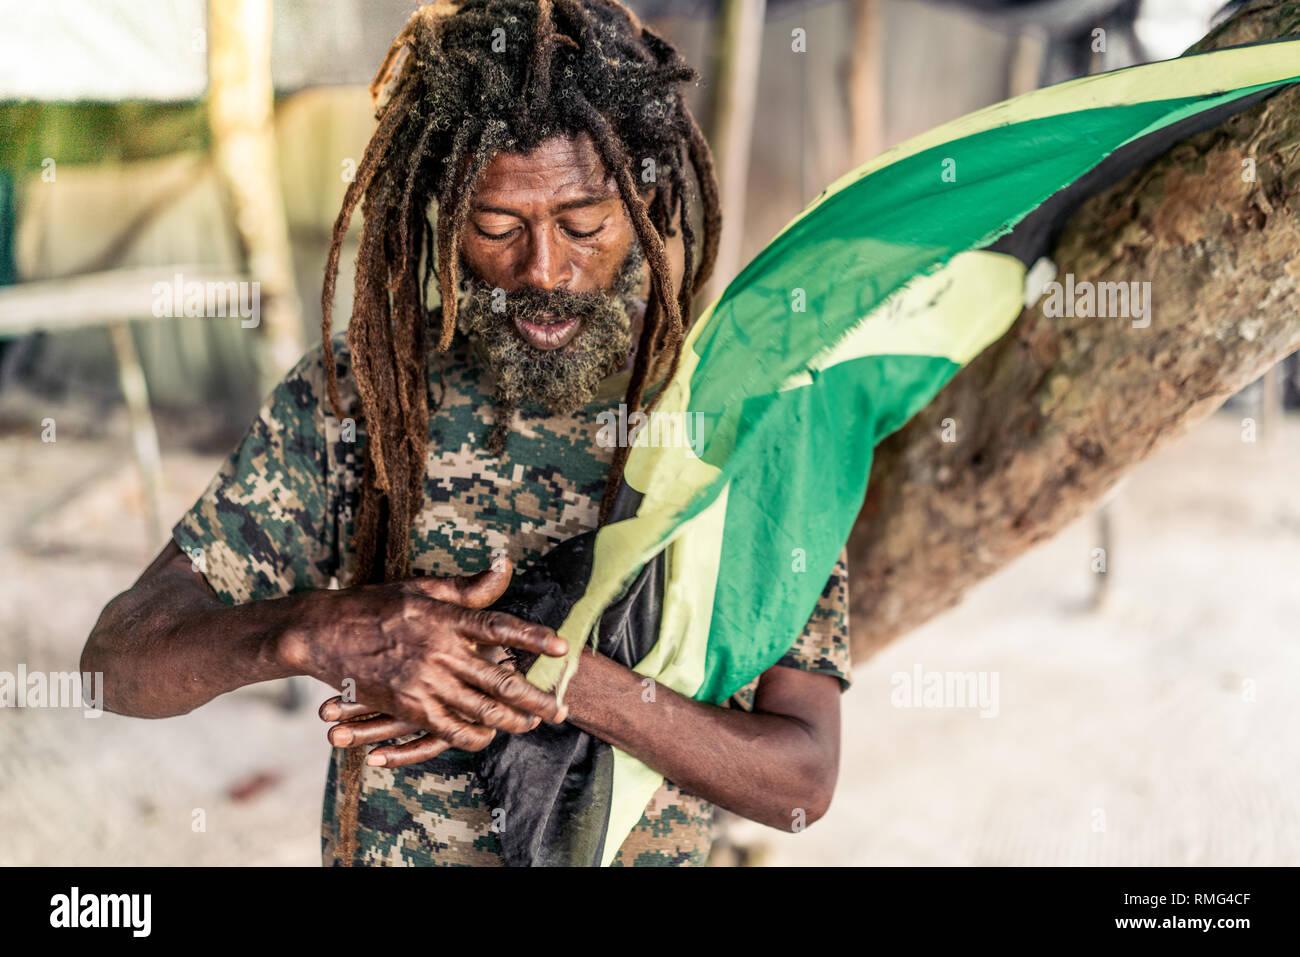 African American bearded male with dreadlocks holding Jamaica flag near tree - Stock Image